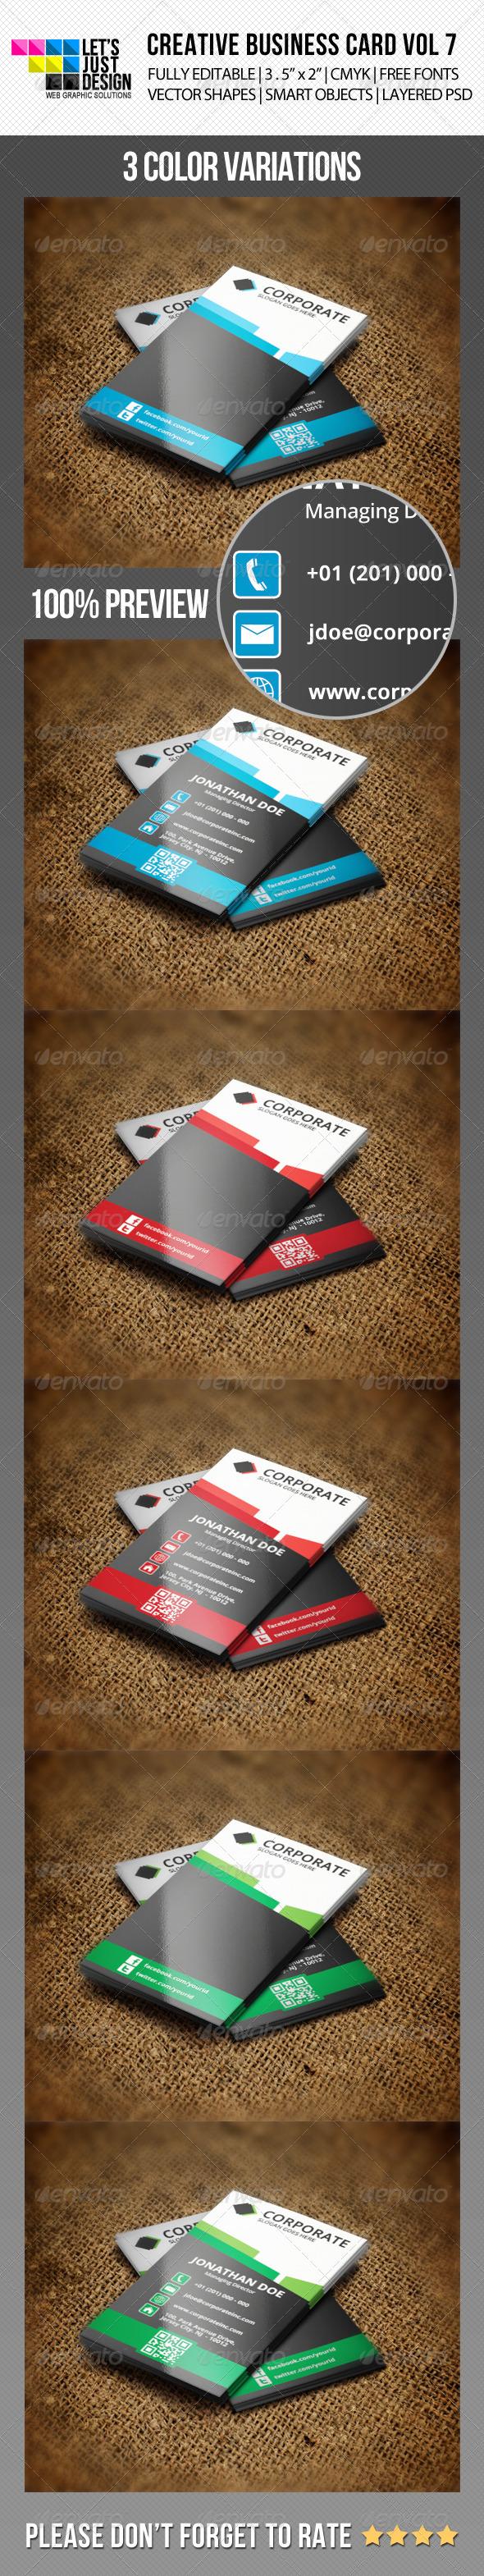 Creative Business Card Vol 7